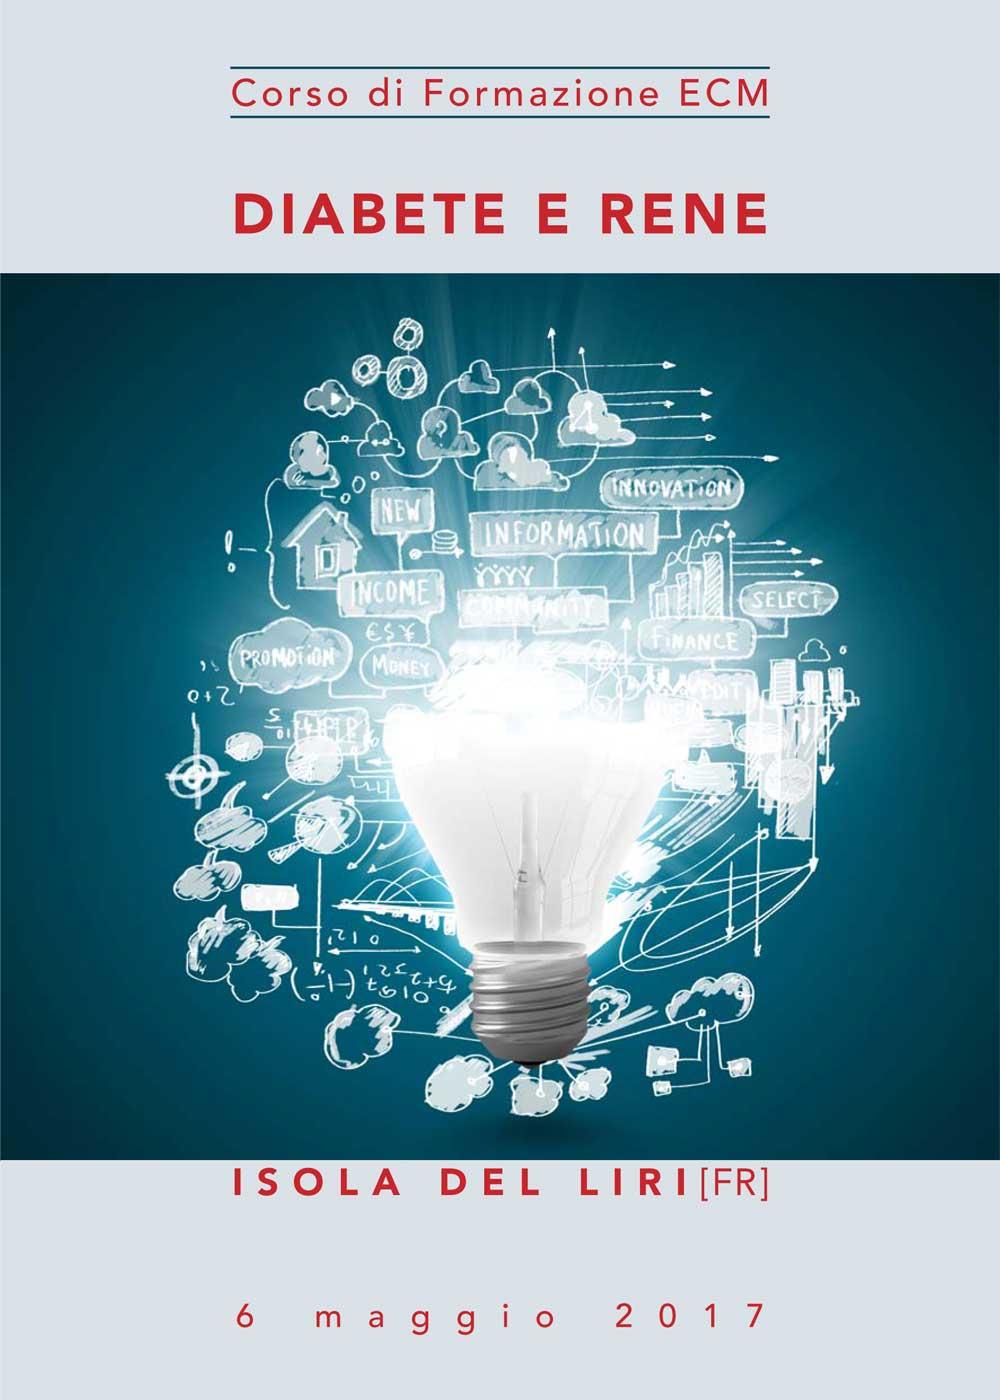 Programma_diabete_e_rene_Isola-del-Liri_1000